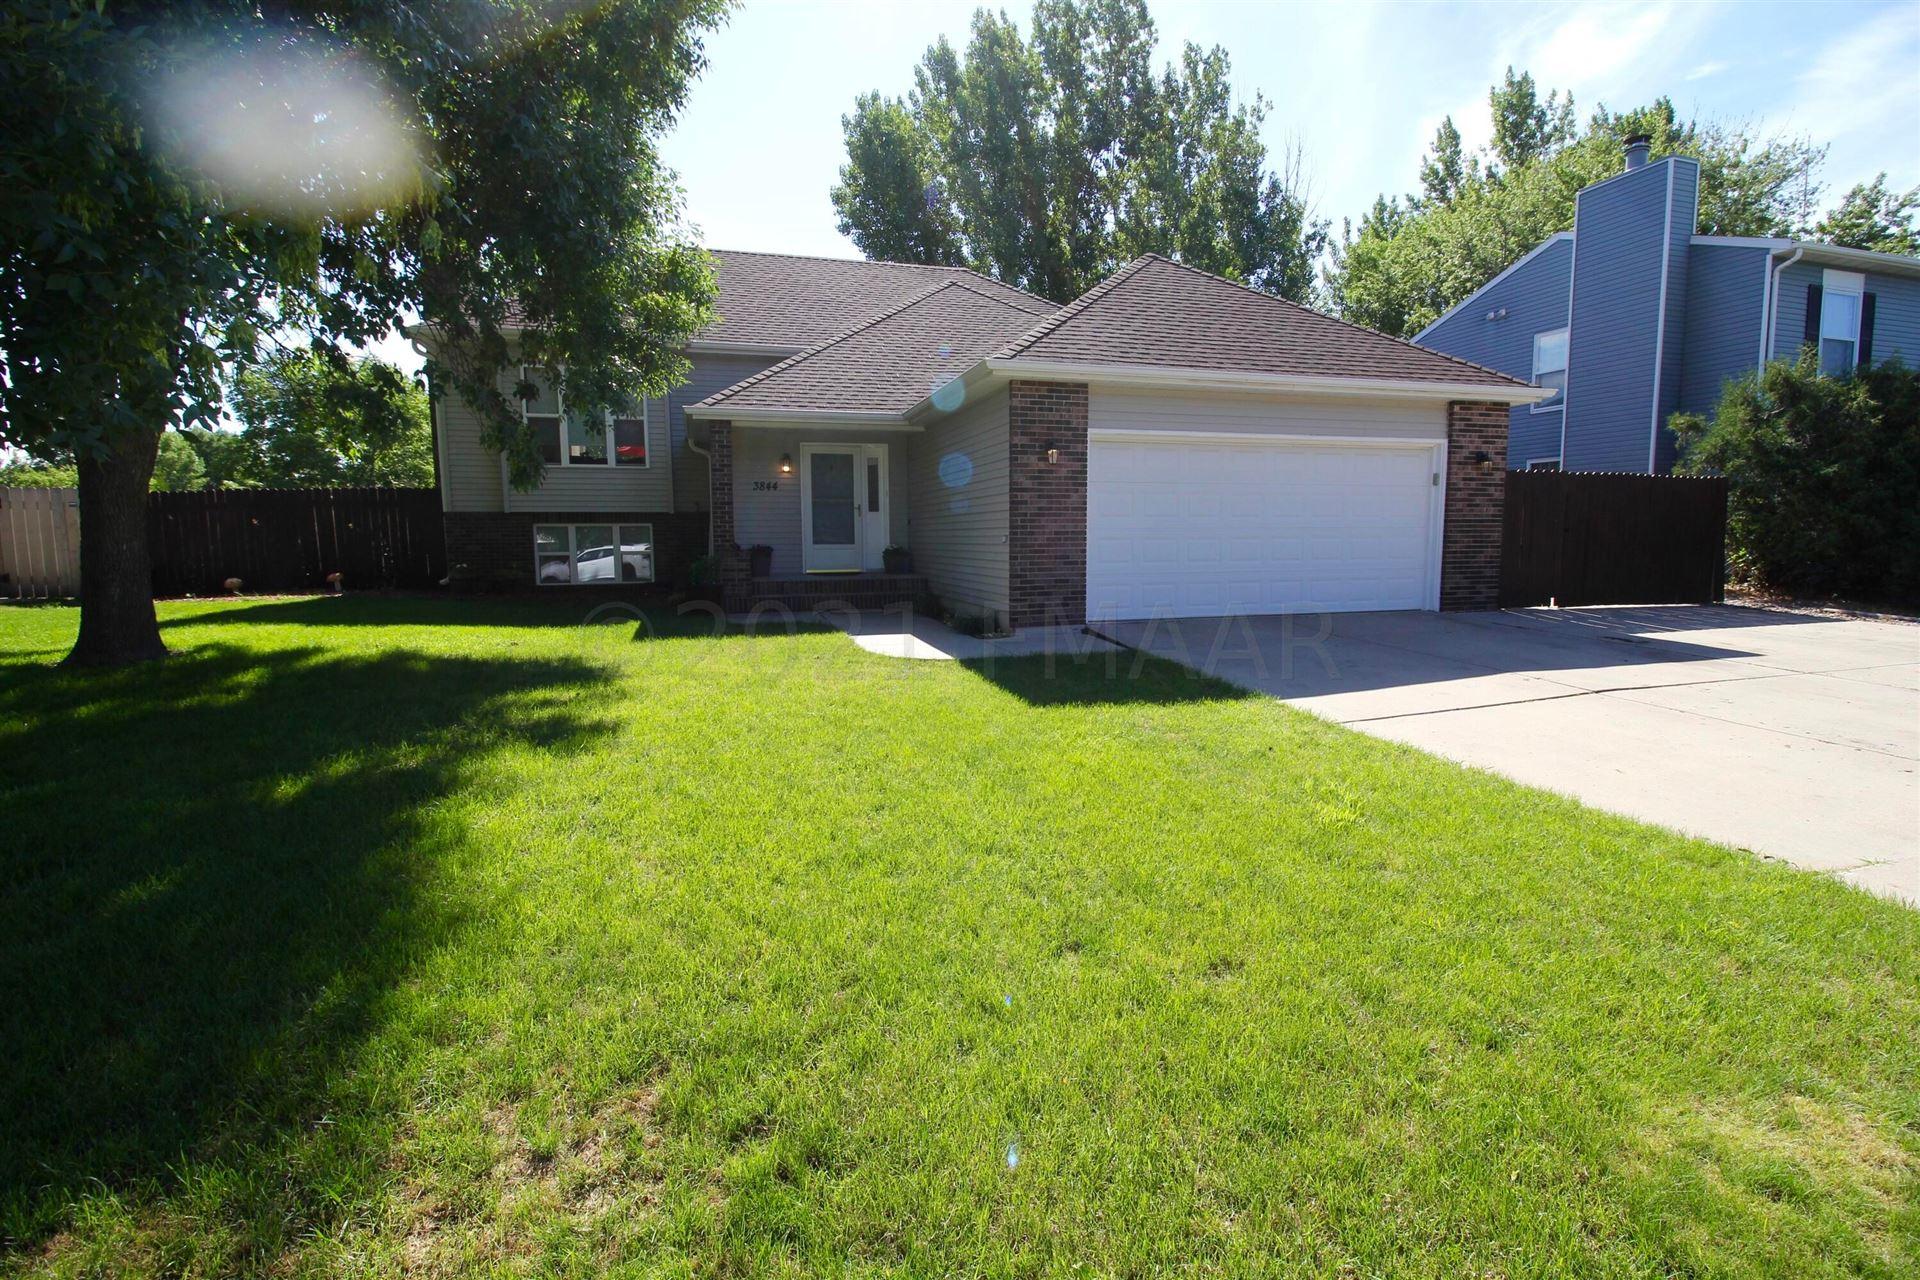 3844 15 Street S, Fargo, ND 58104 - #: 21-3481